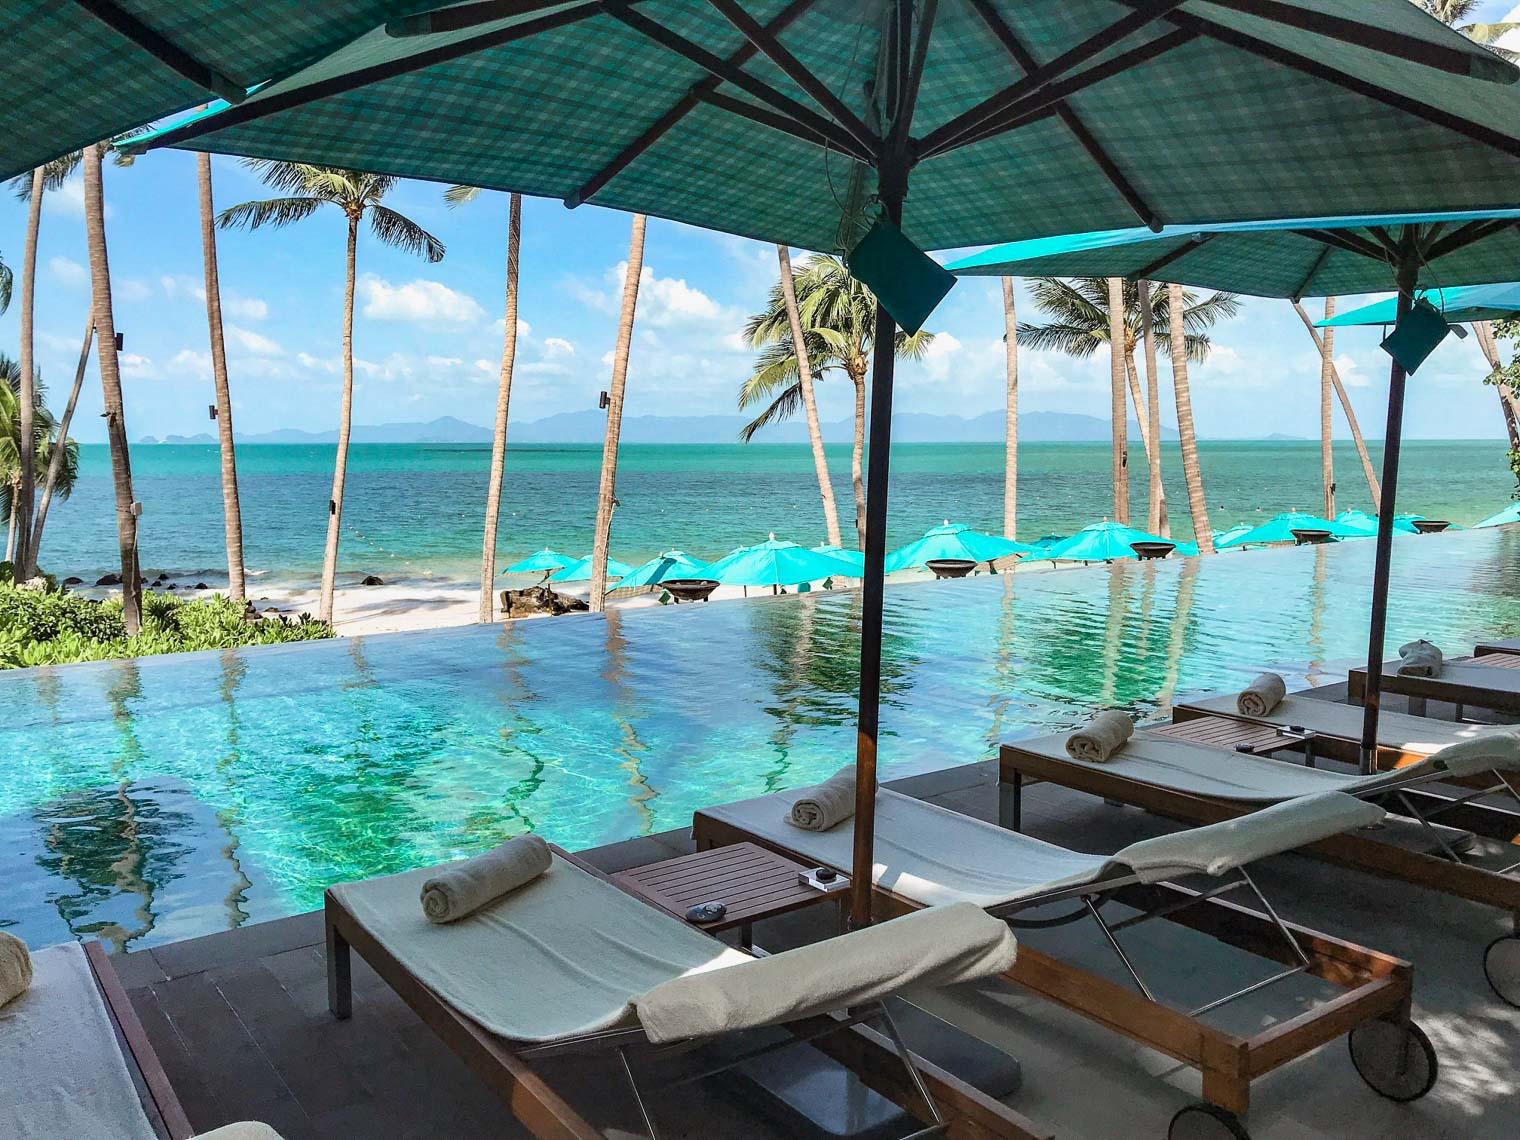 Hotel pool at Four Seasons hotel Koh Samui